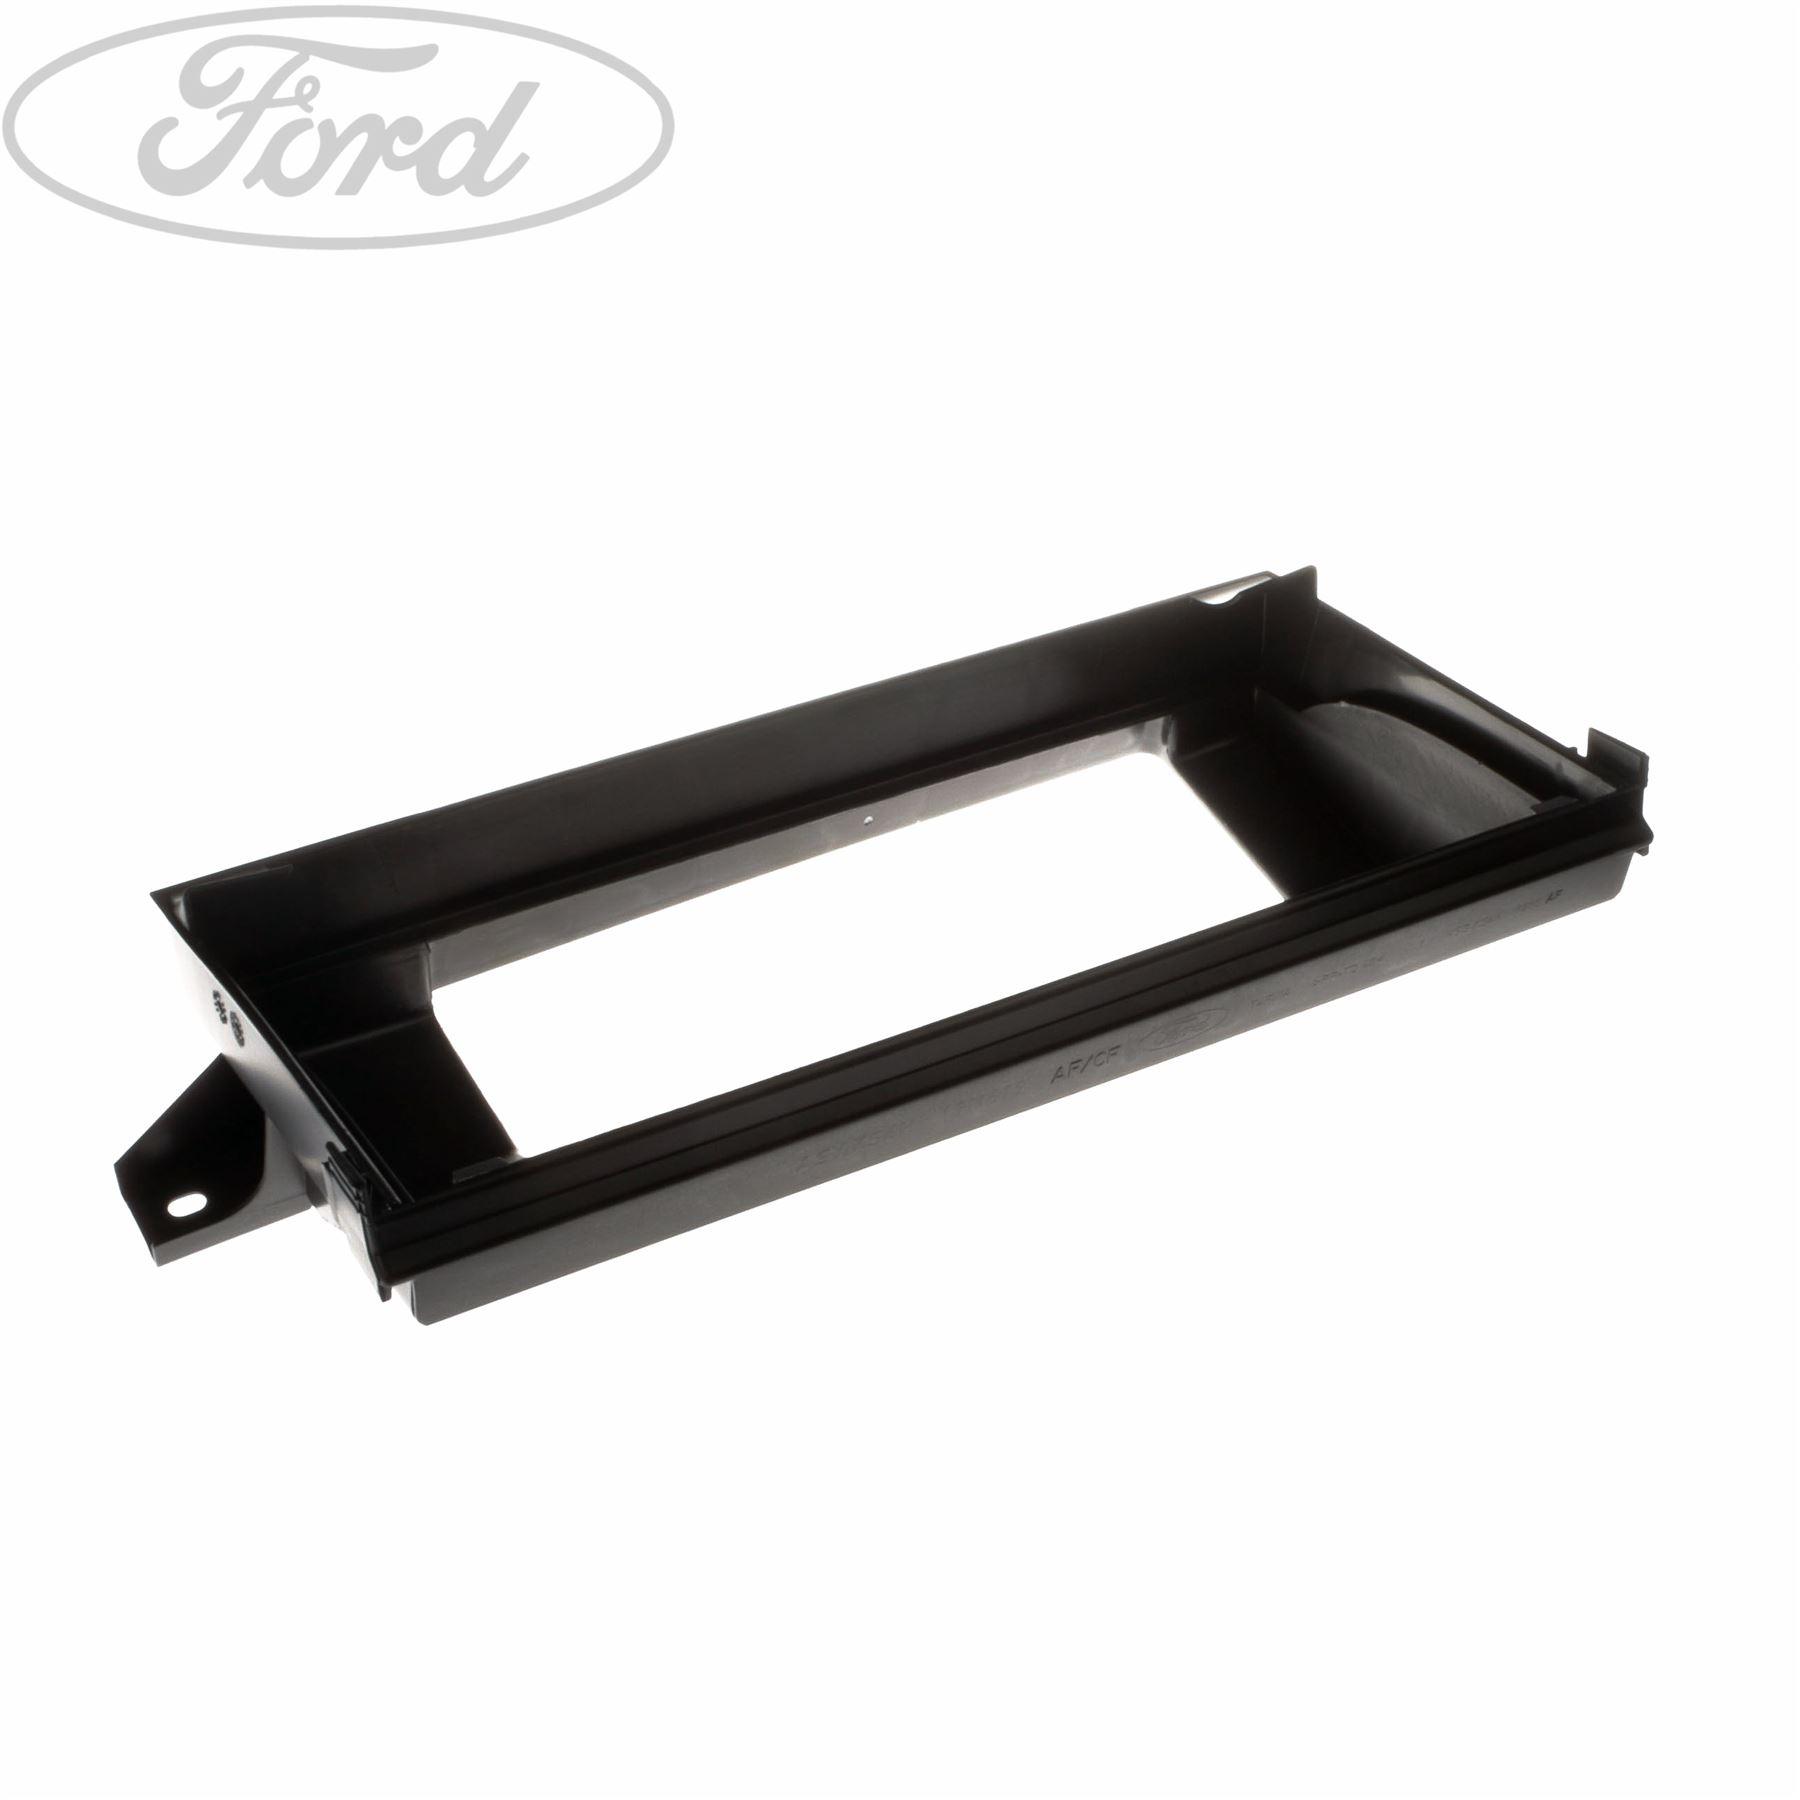 Ford Focus MK1 1.4 1.6 1.8 2.0 1.8TDCi 1.8 TDdi Pollen Cabin Filter 1998-2004